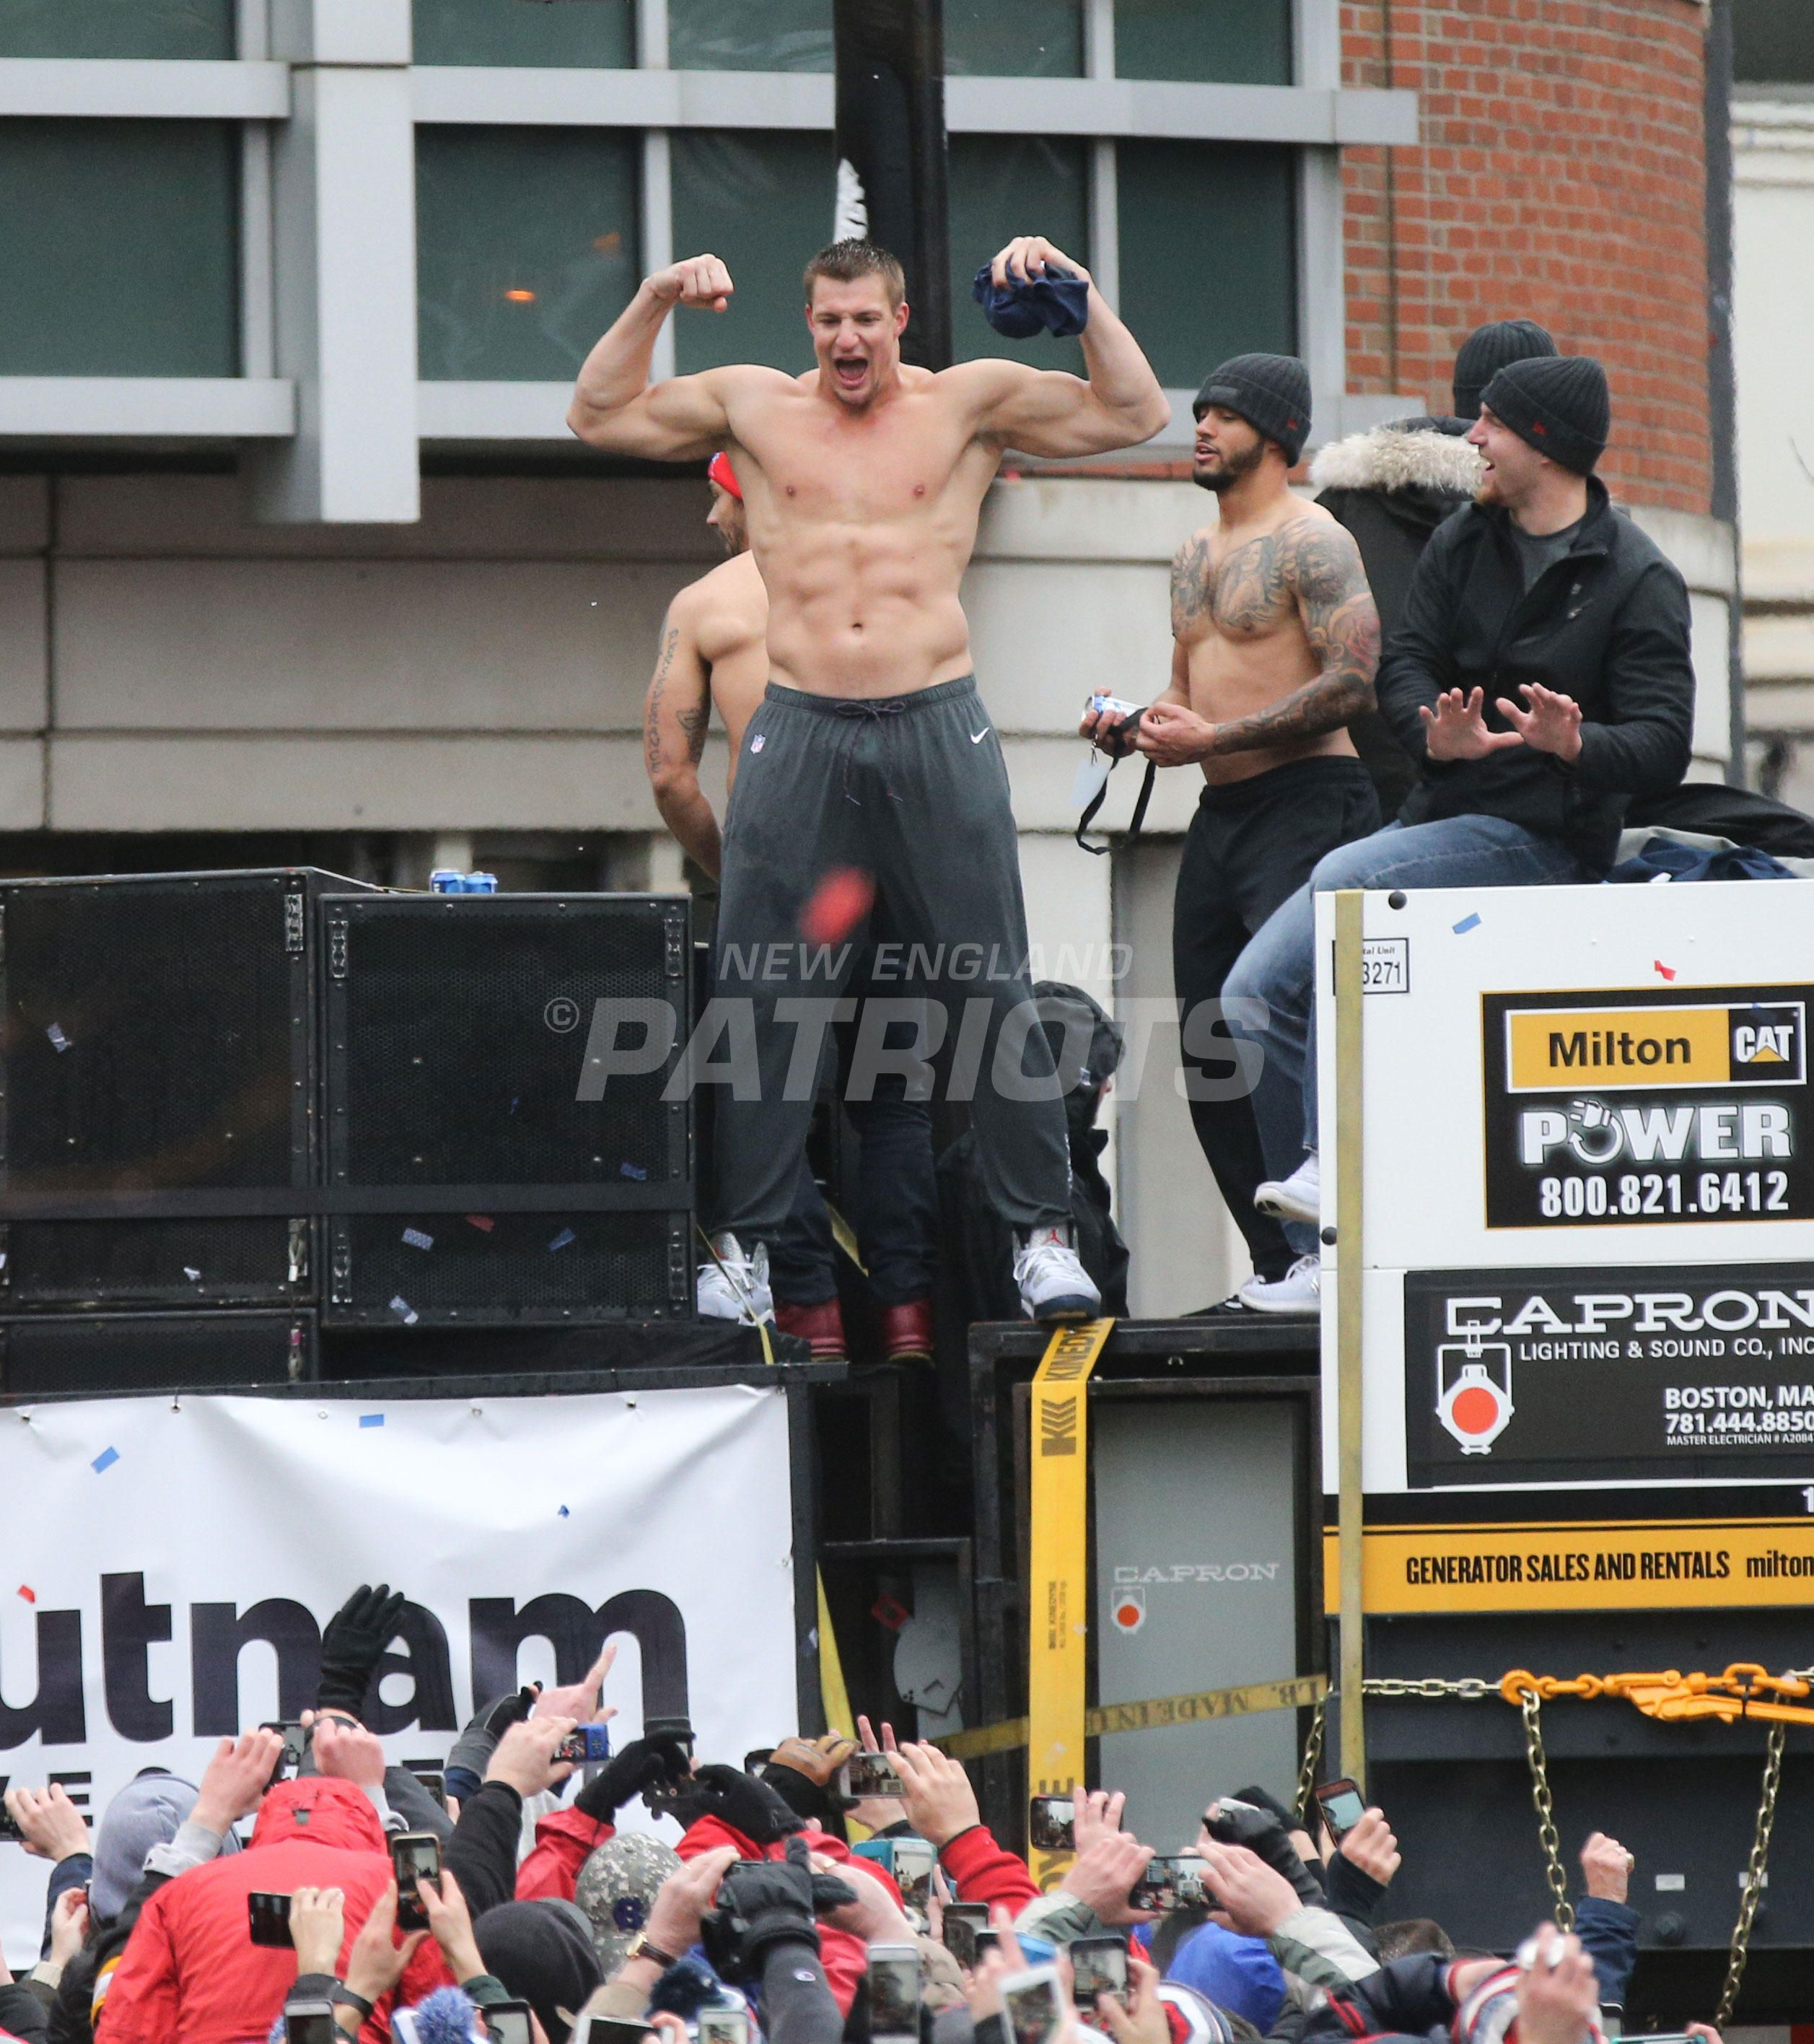 Patriots Super Bowl Li Victory Parade Gronk Patriots Patriots Football New England Patriots Football